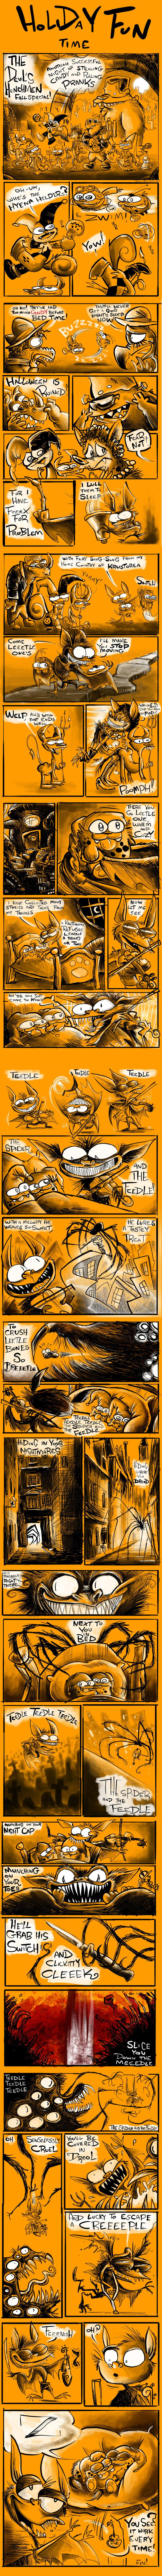 Devil's Henchmen Halloween Fun